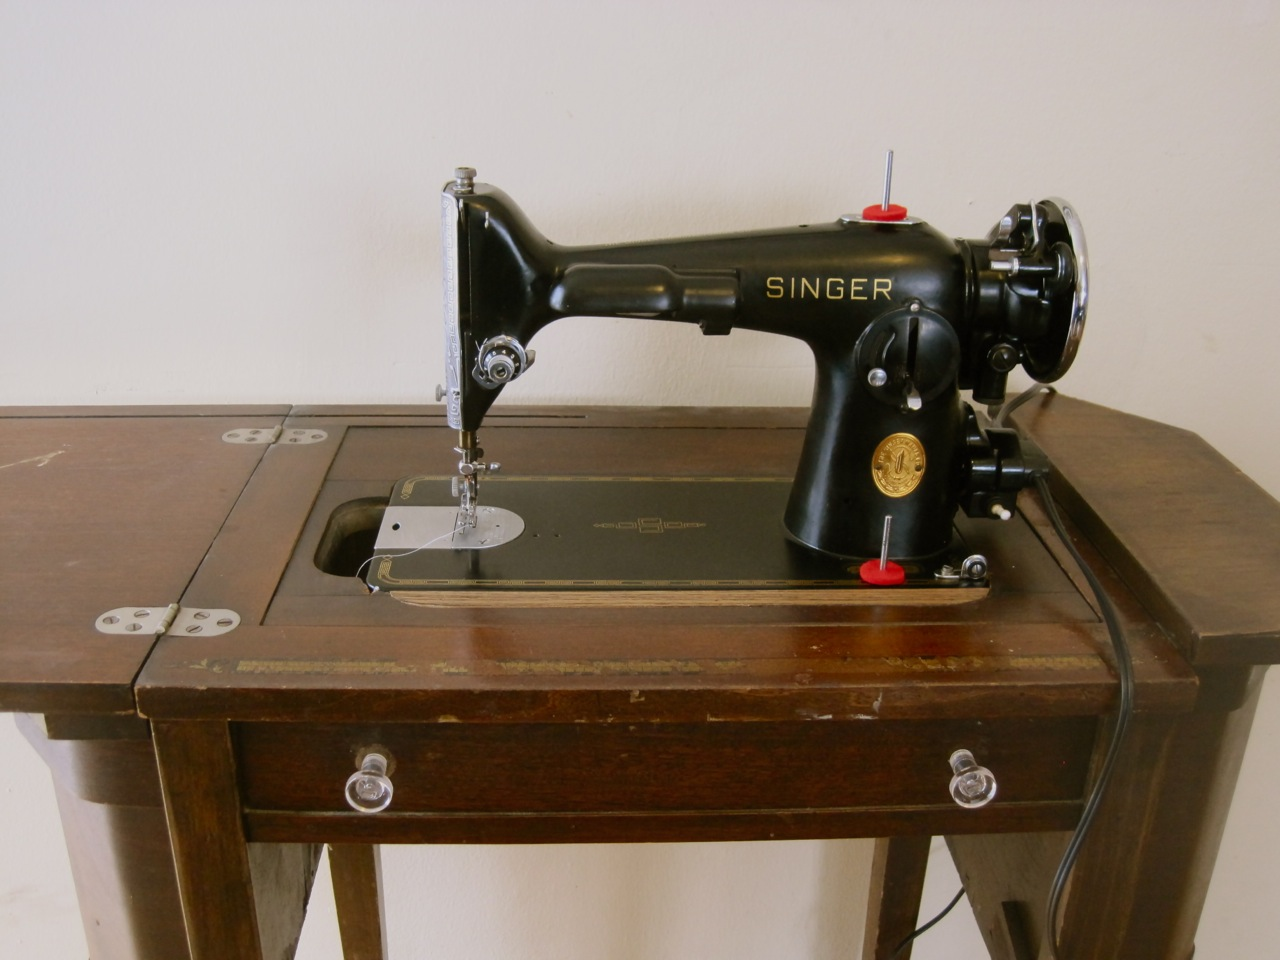 singer 201 2 sewing machine motor re wire rebuild [ 1280 x 960 Pixel ]